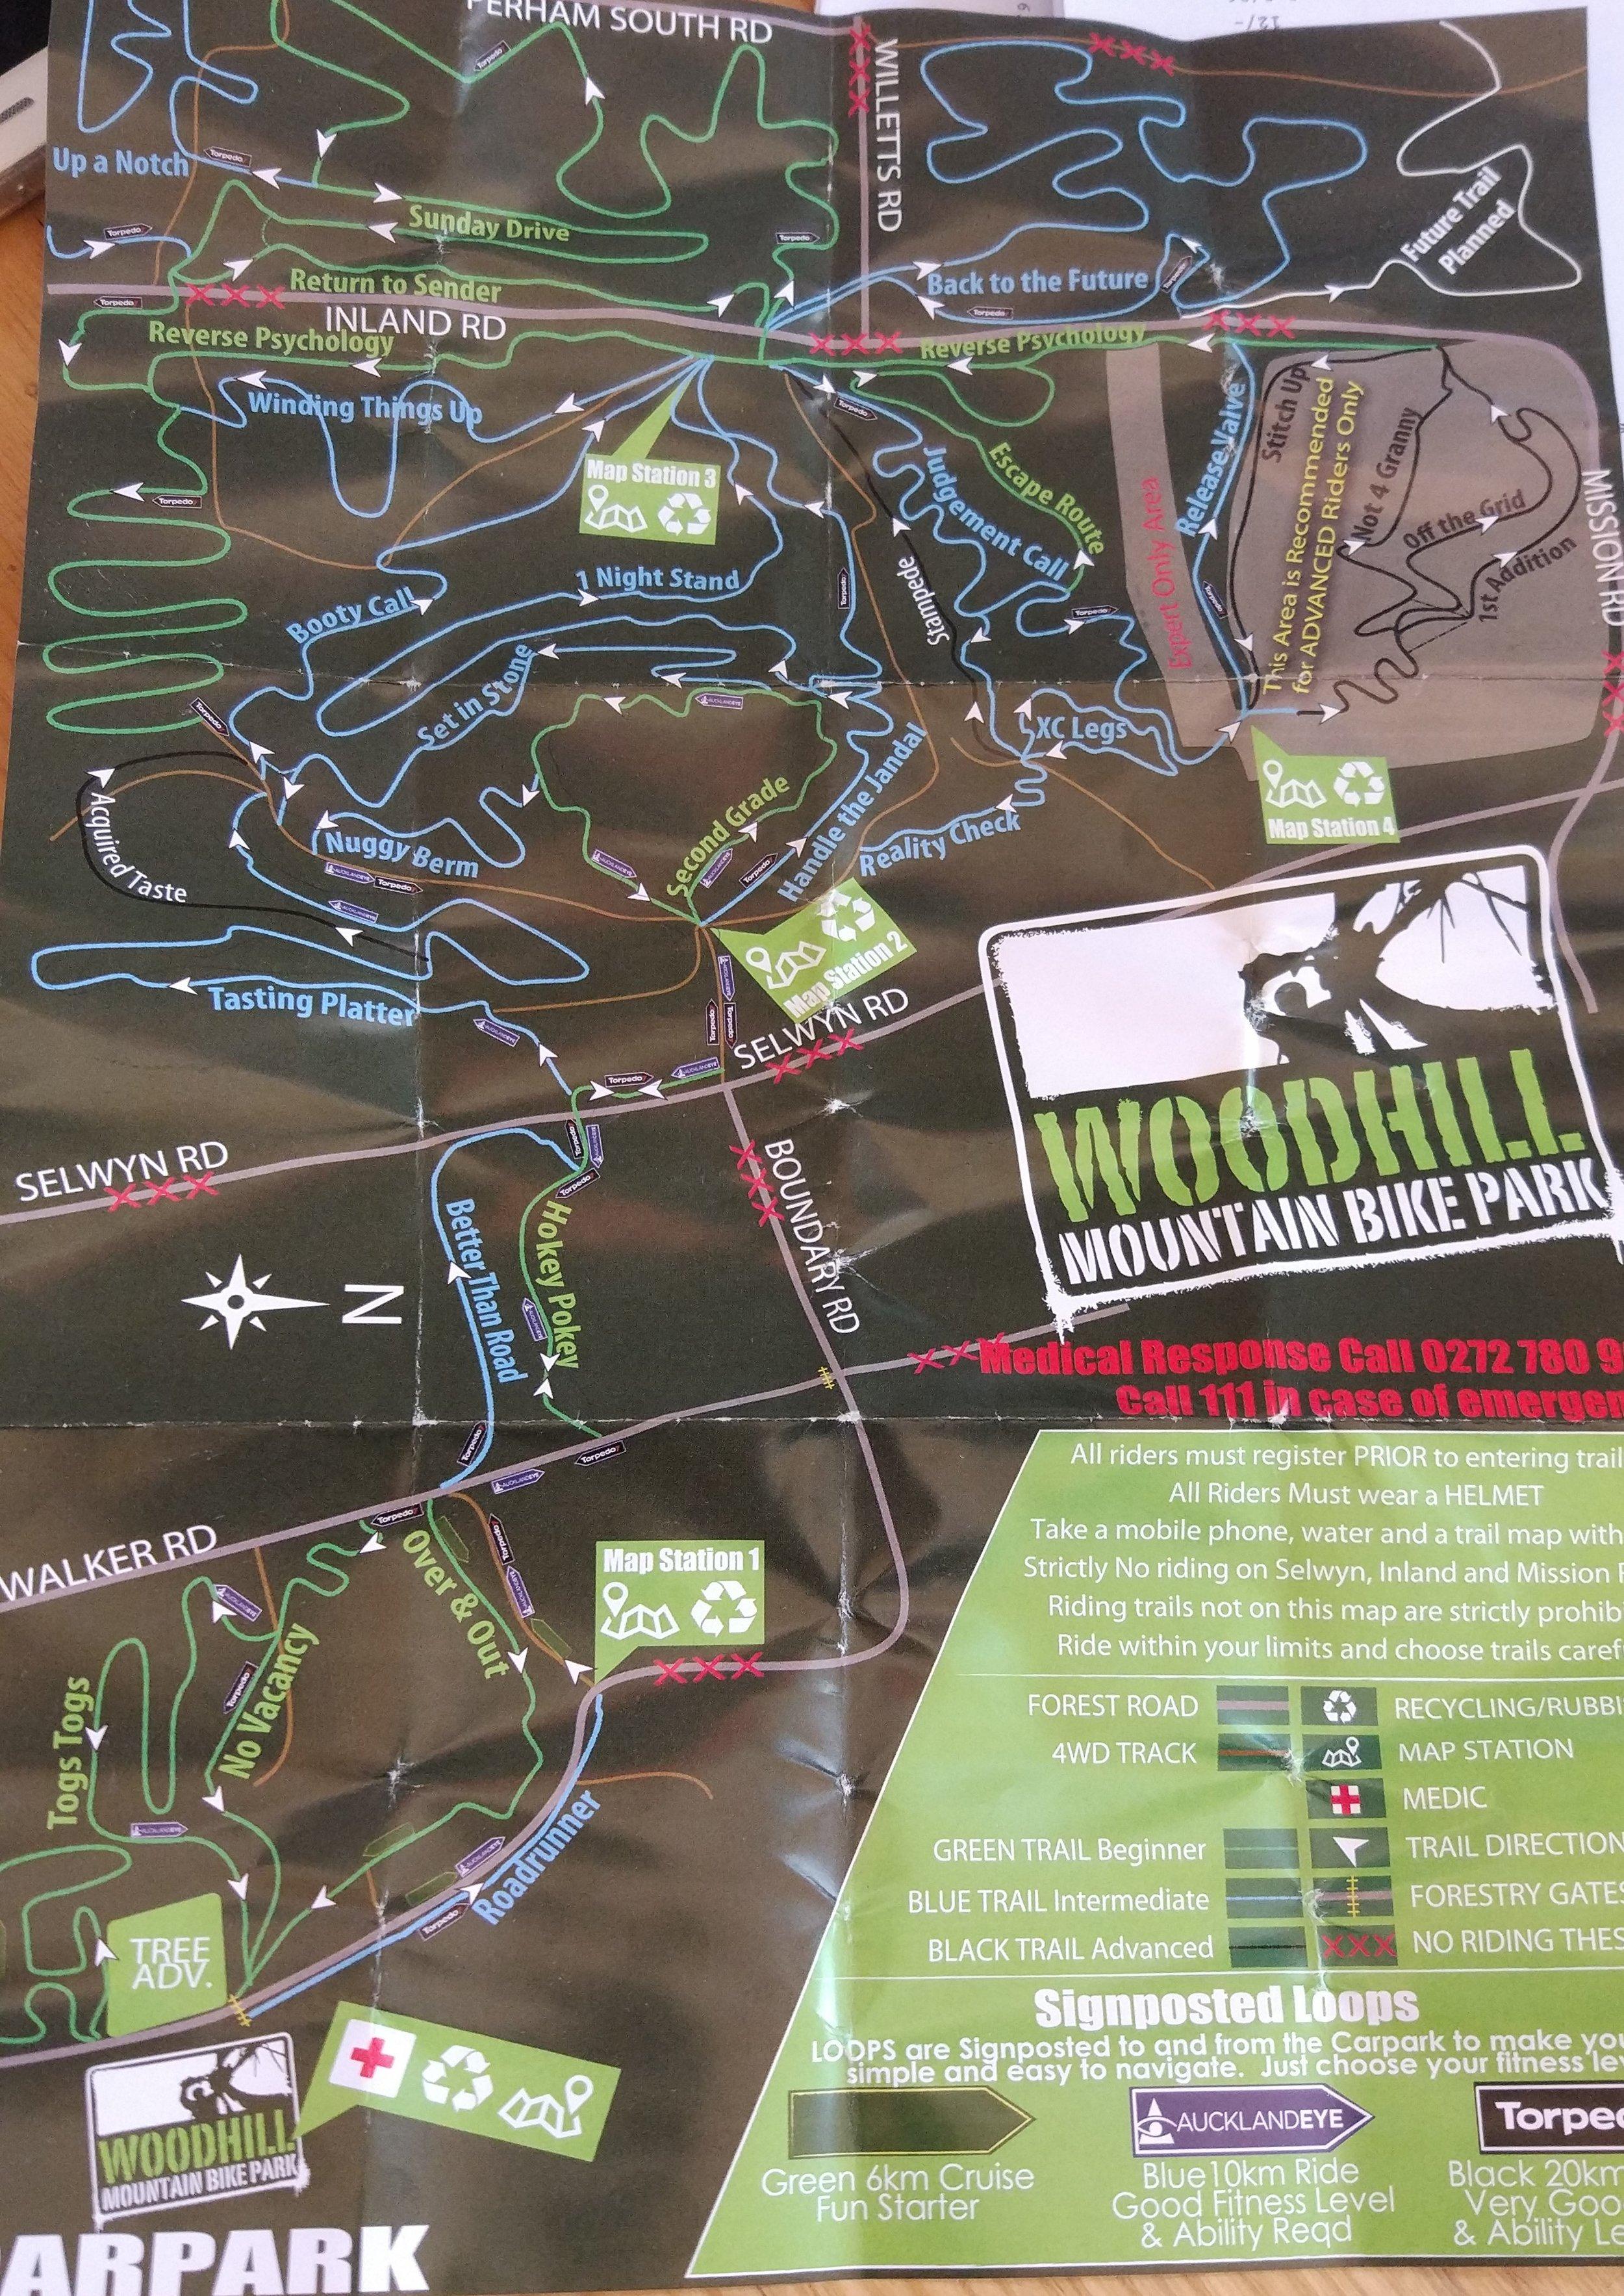 20171021_new_zealand_woodhill_trail_map.jpg